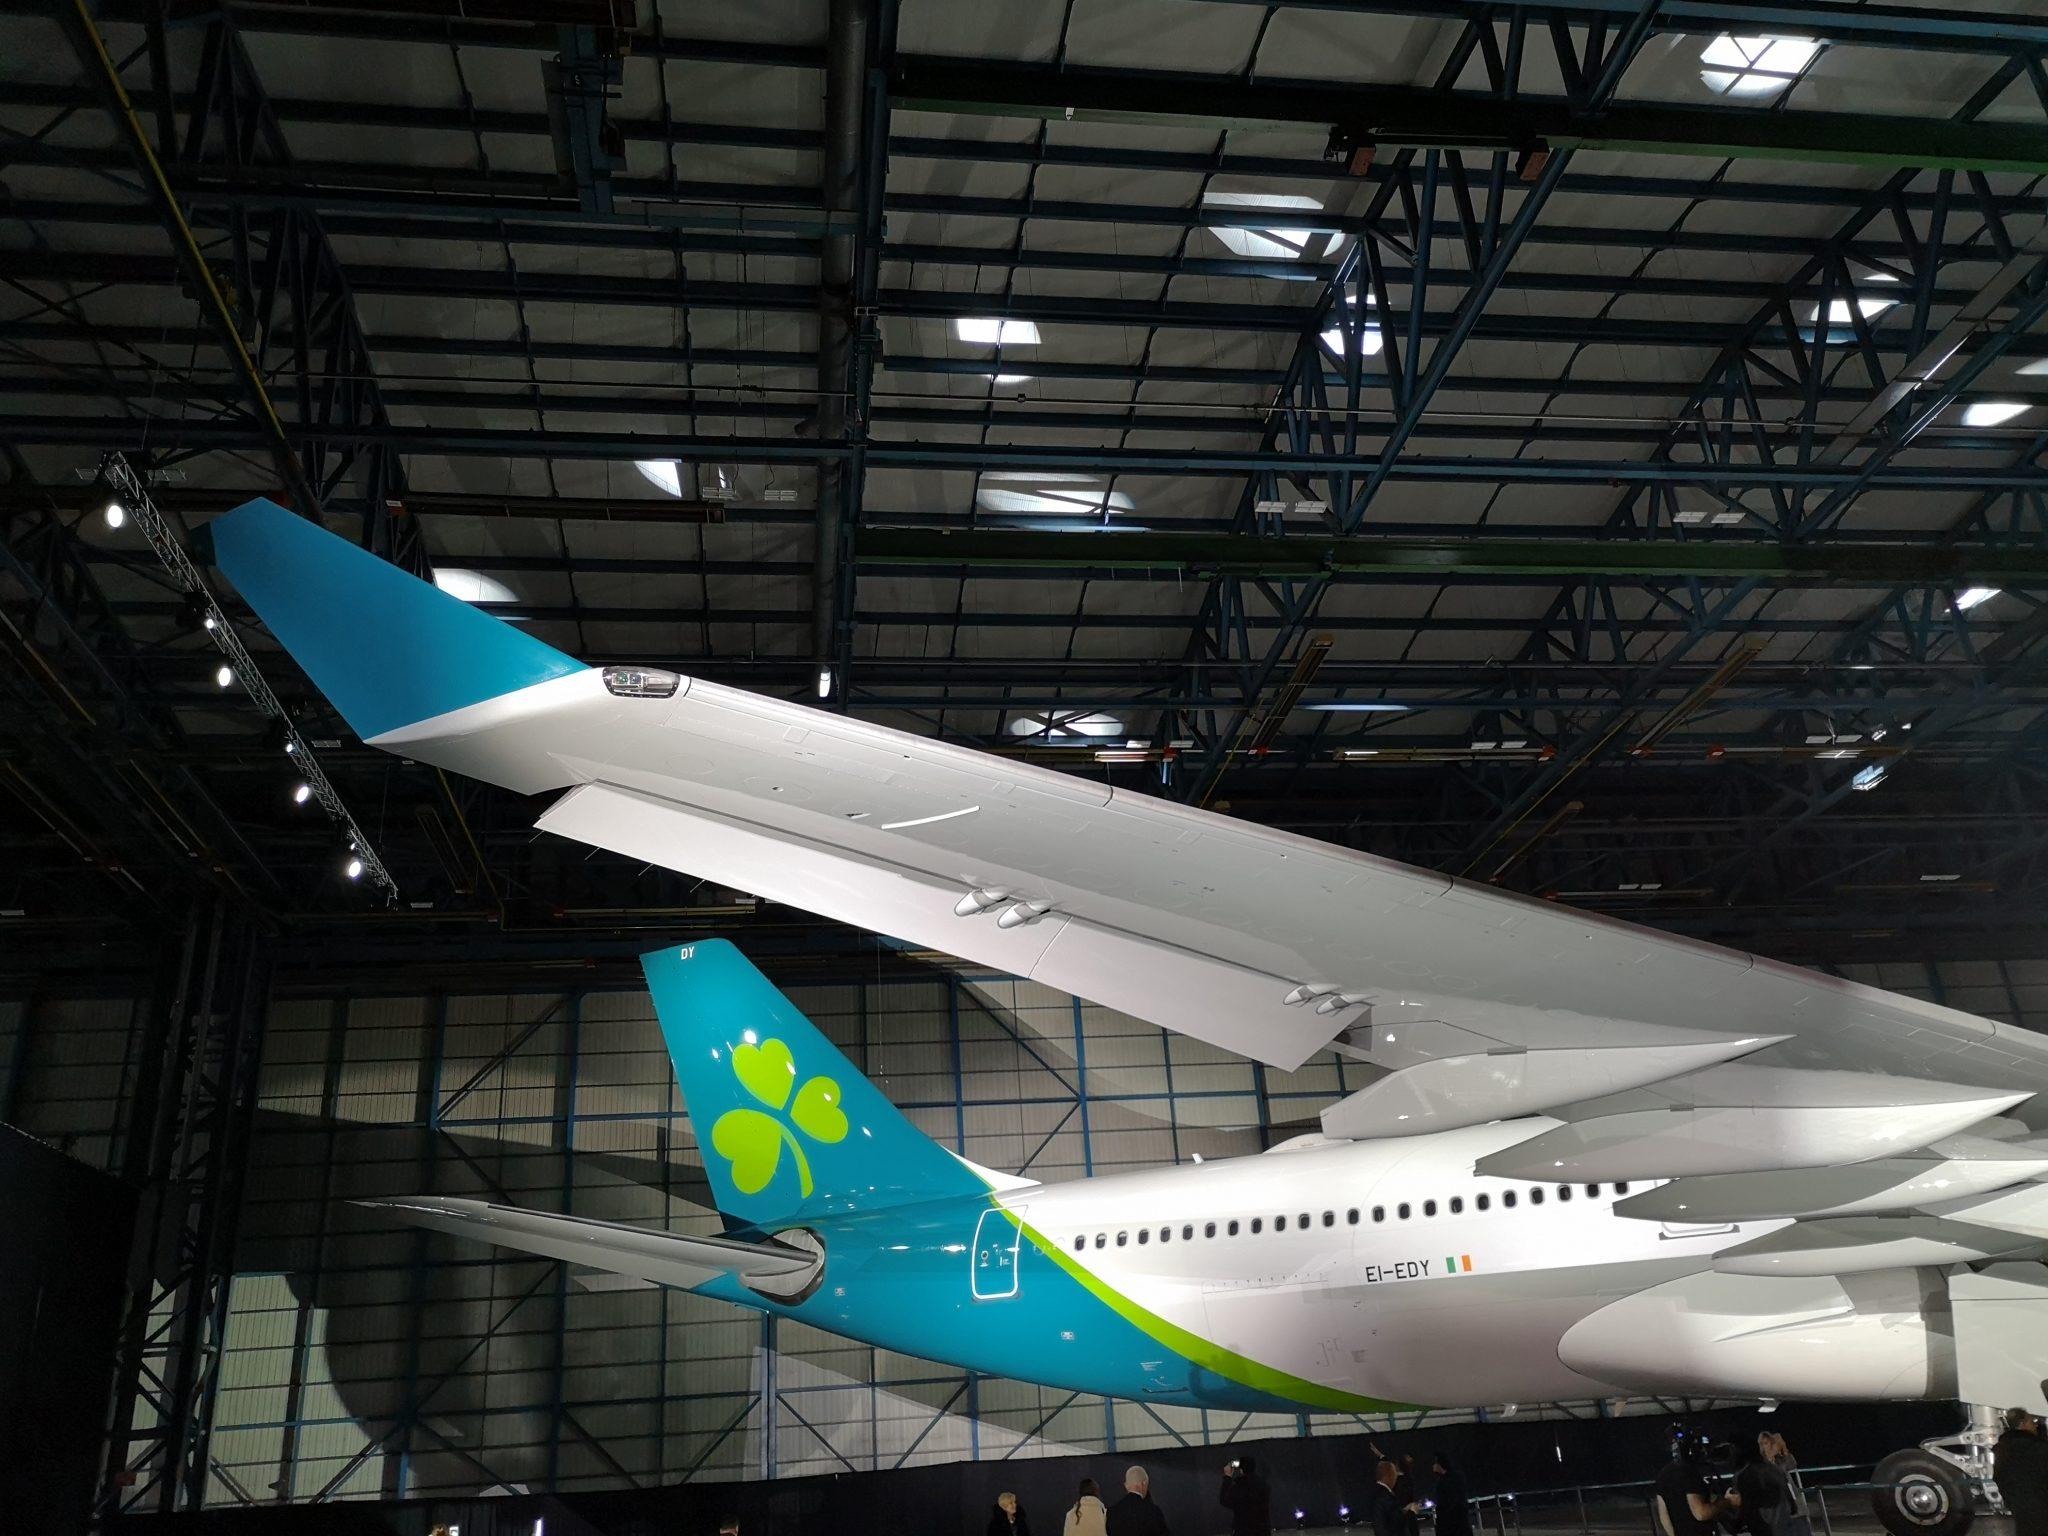 Aer Lingus unveils rebrand as carrier aims for transatlantic growth